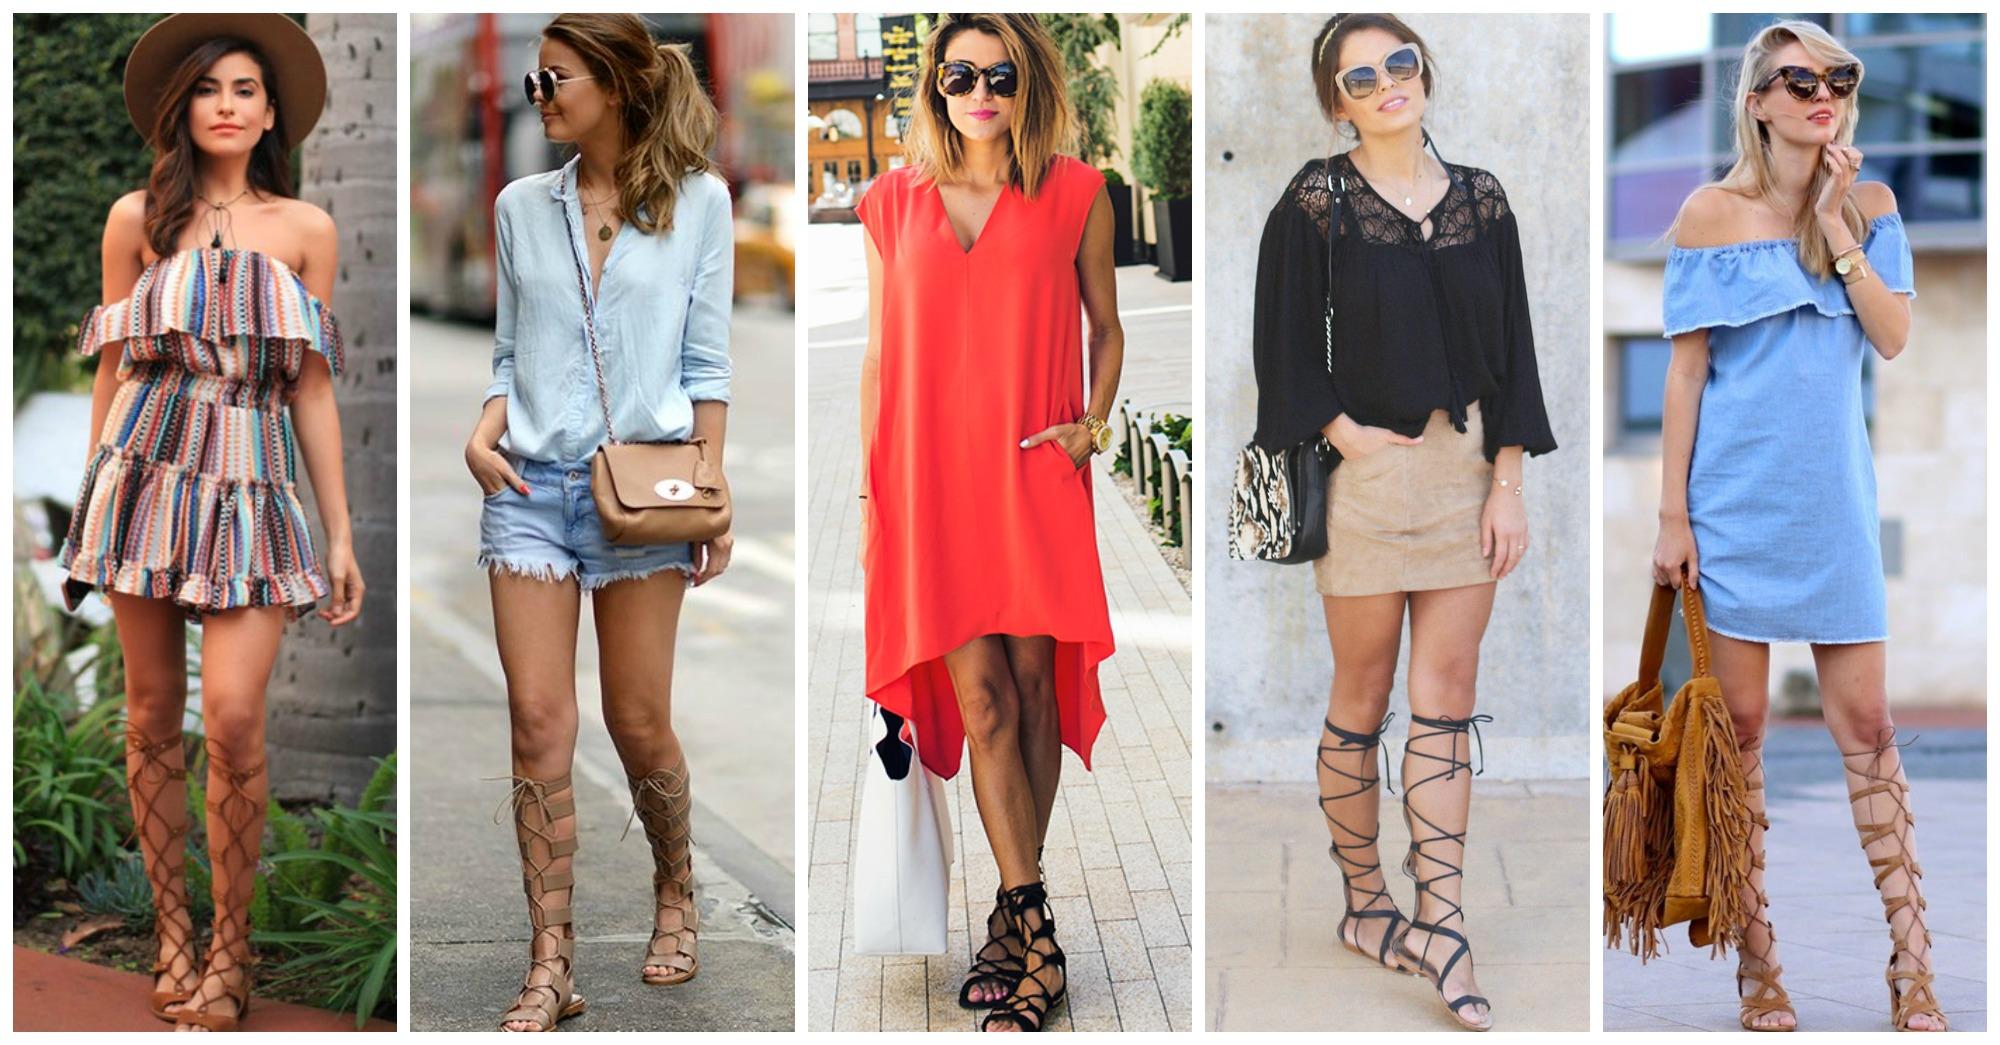 15 Fashionable Ways to Wear Gladiator Sandals